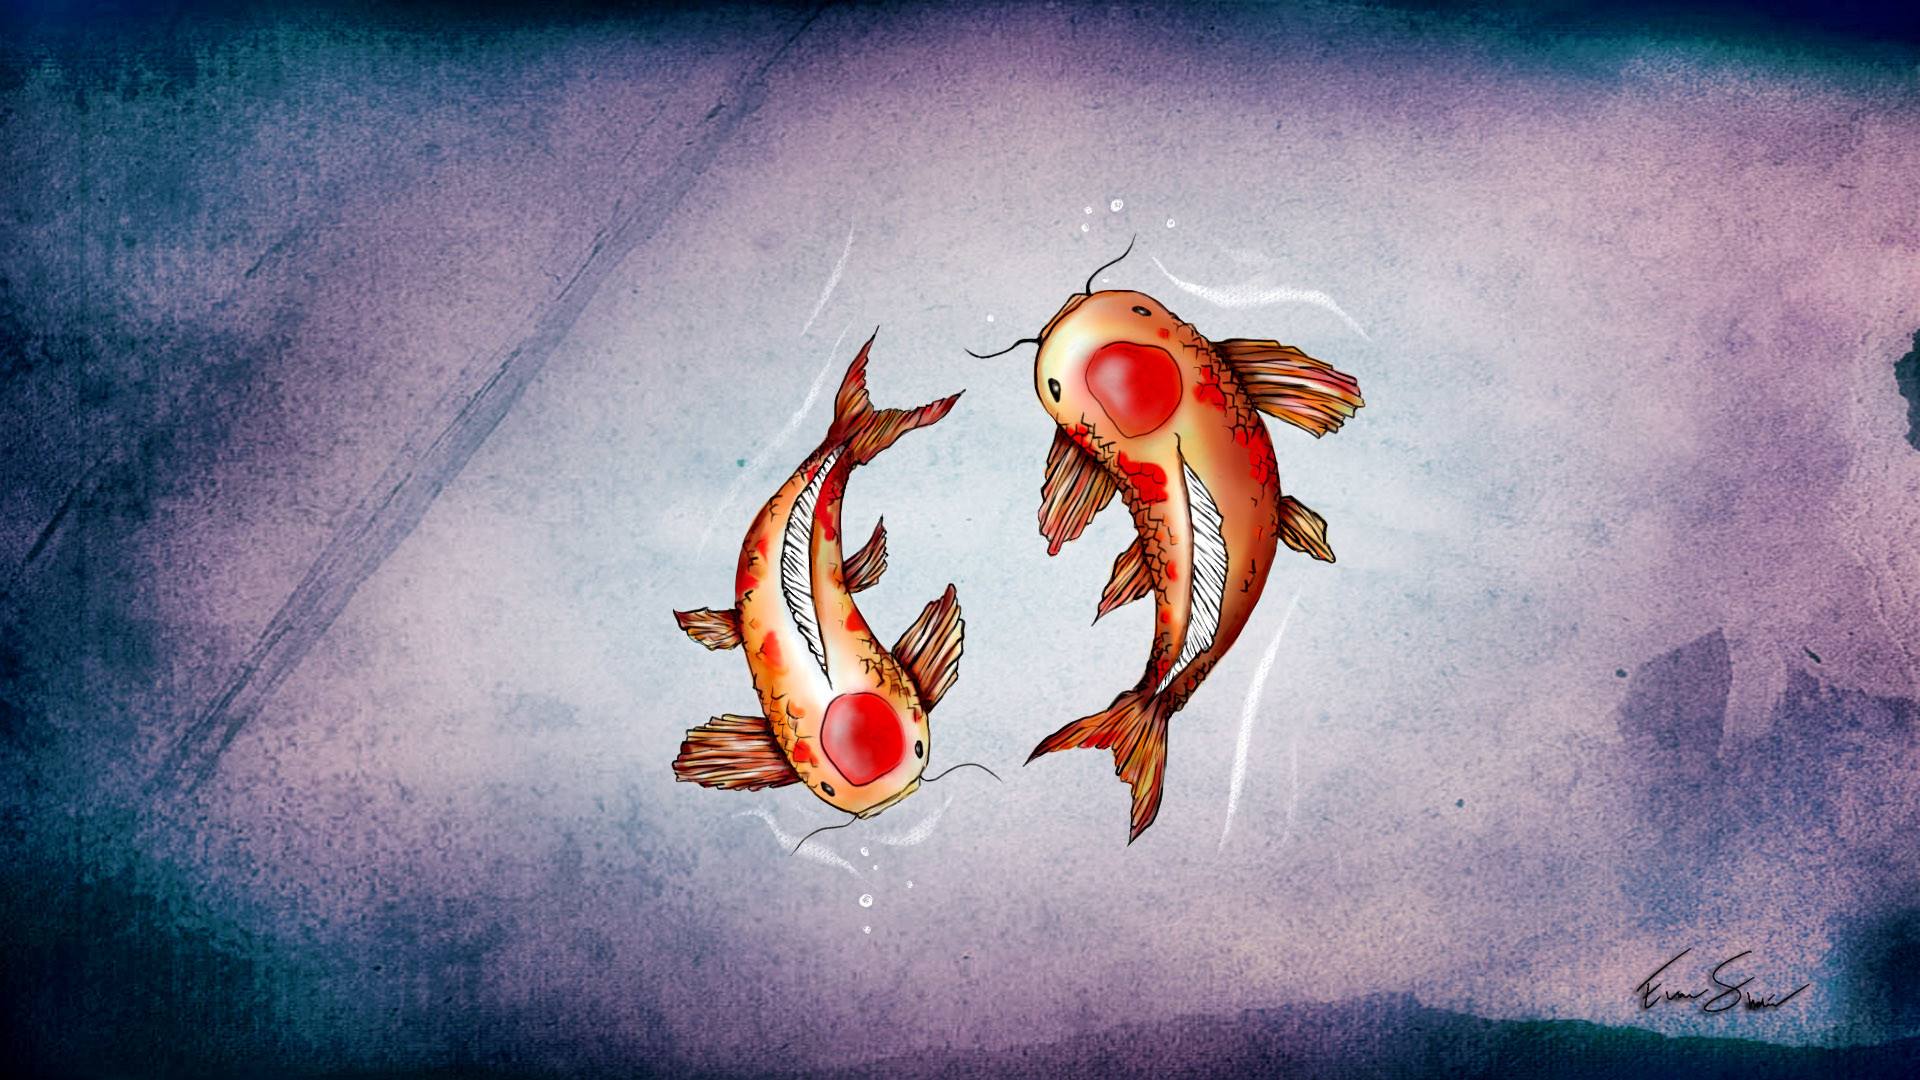 koi fish live wallpaper free download for windows xp wallpaper